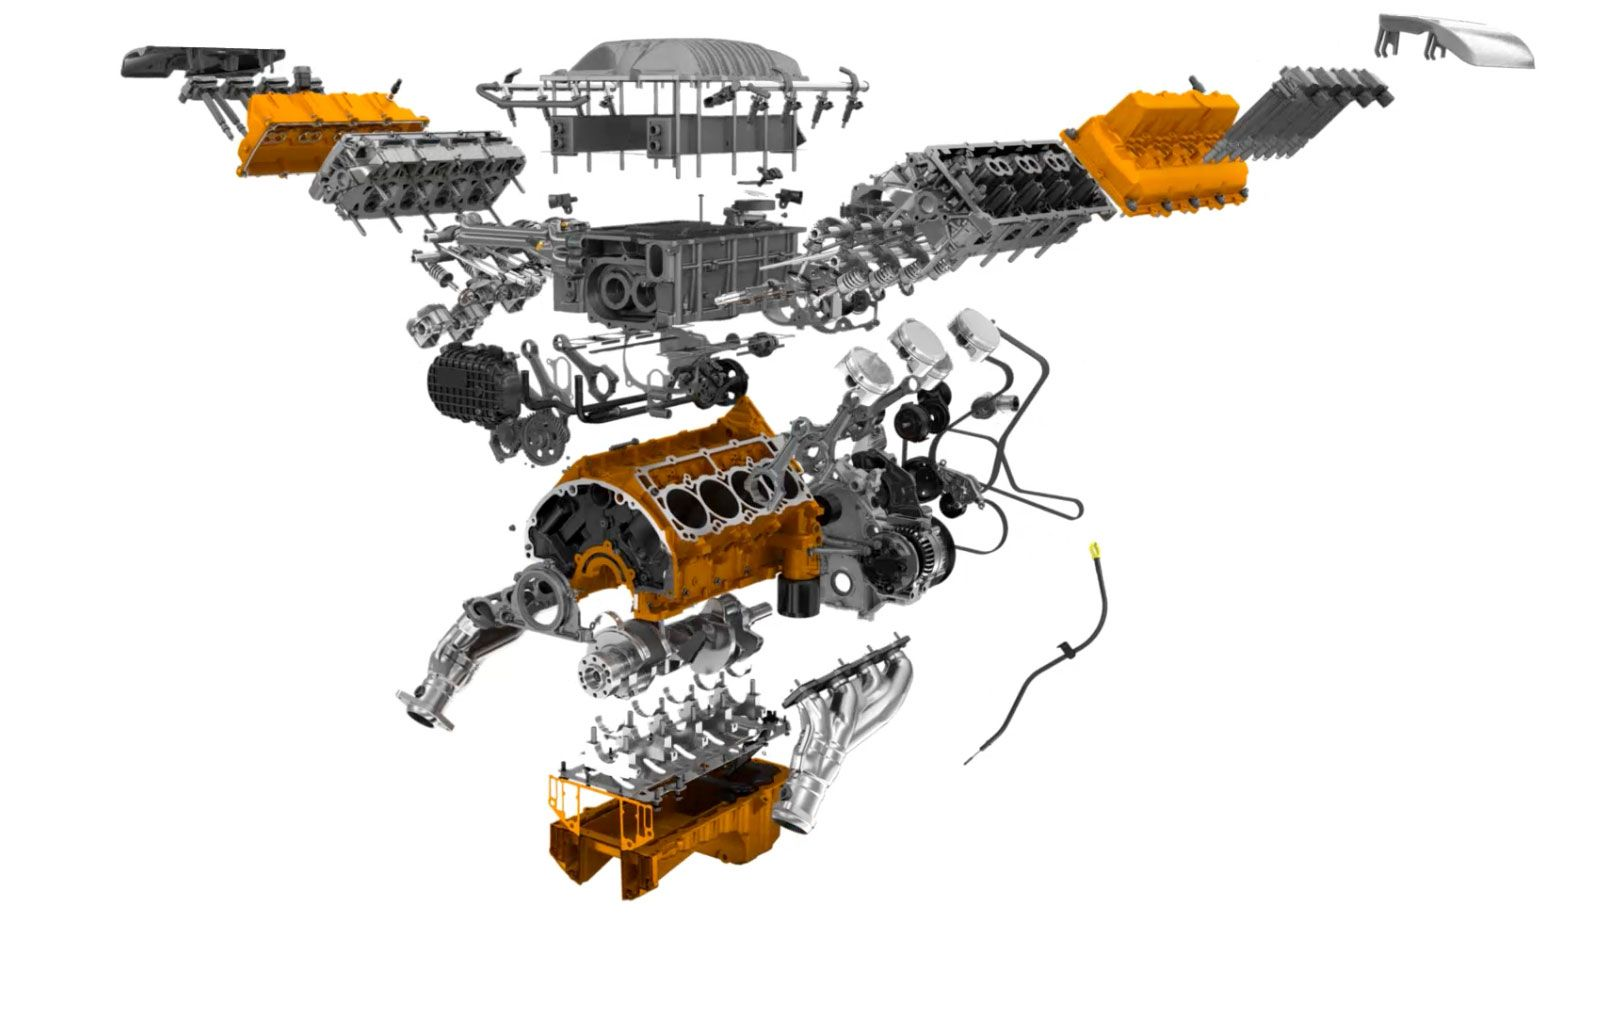 hight resolution of 2015 challenger hemi engine diagram wiring diagram mega 2015 dodge challenger engine diagram 707 hp 6